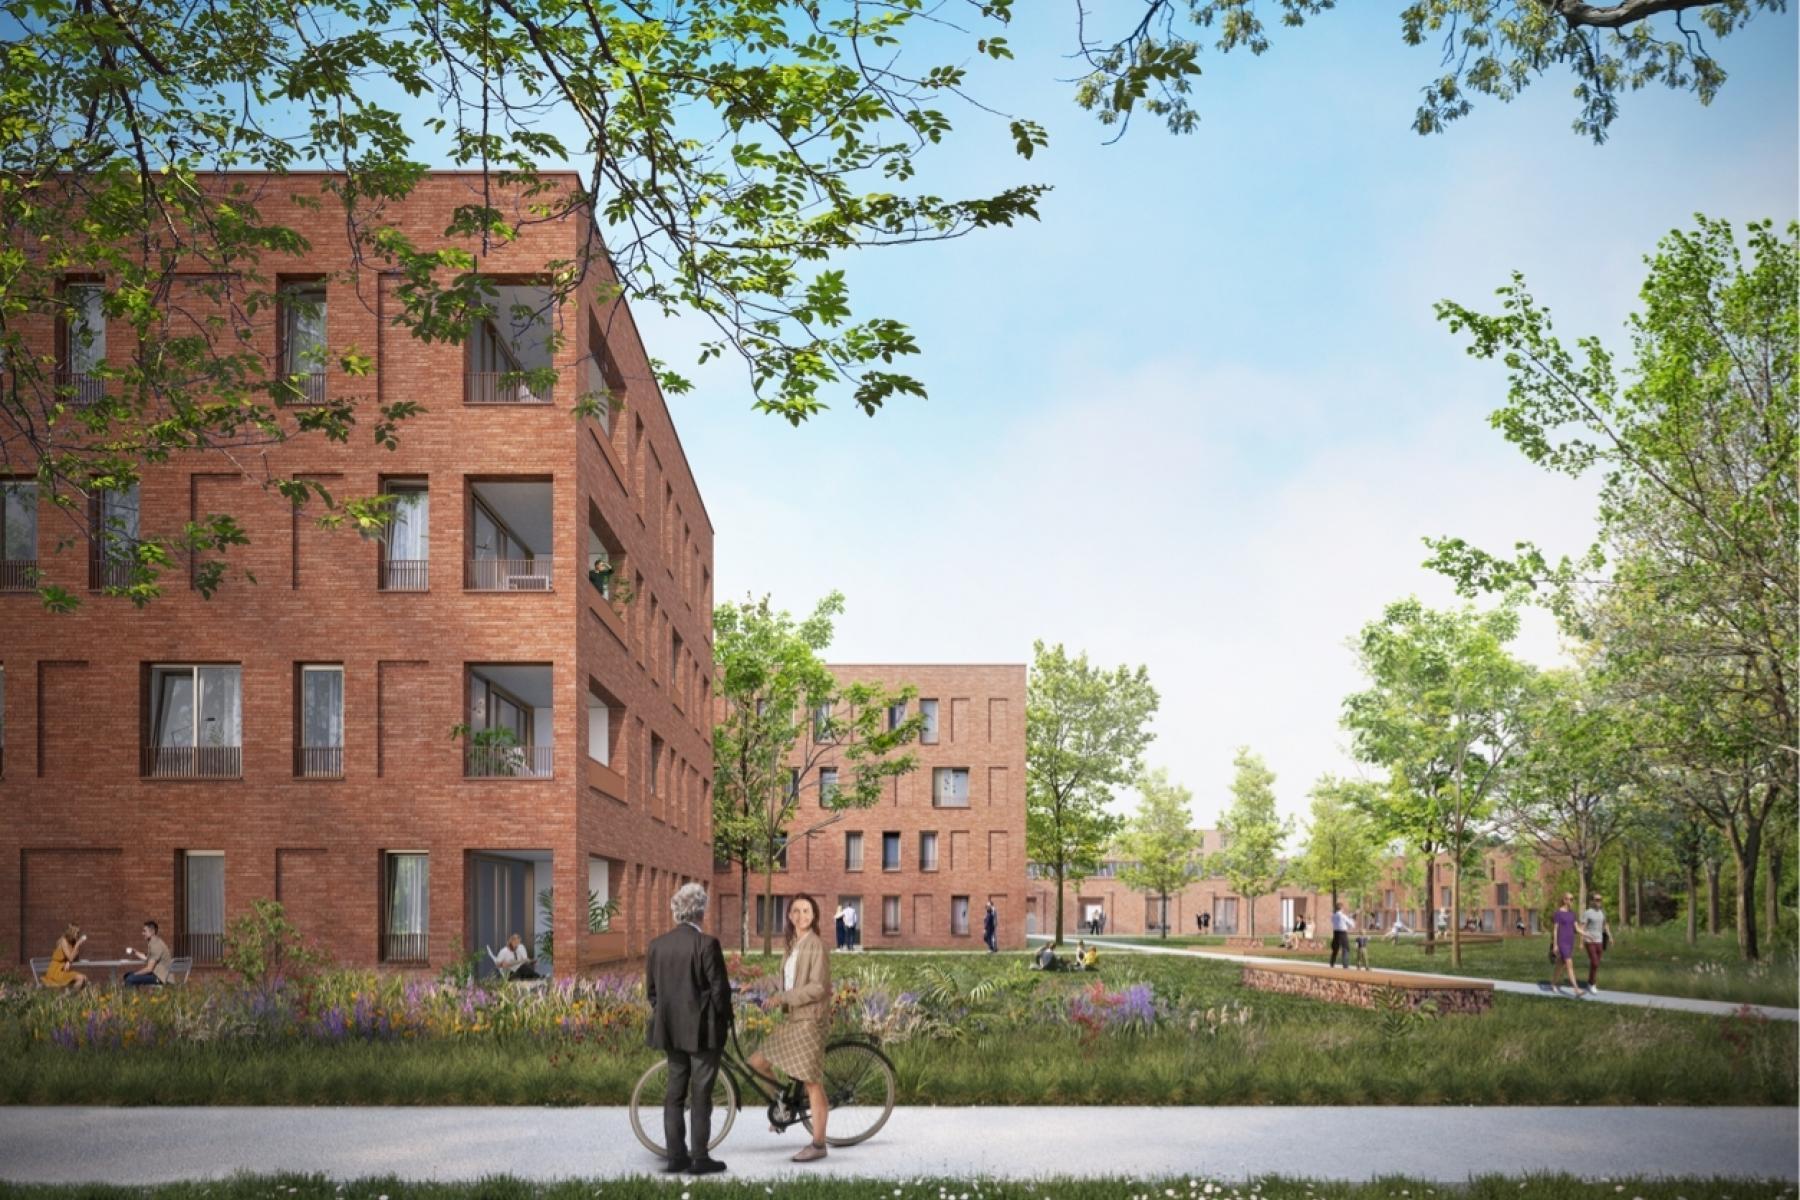 Revive Saffrou 2019 01 30 Beeld 04 Urban Villas Parkzijde